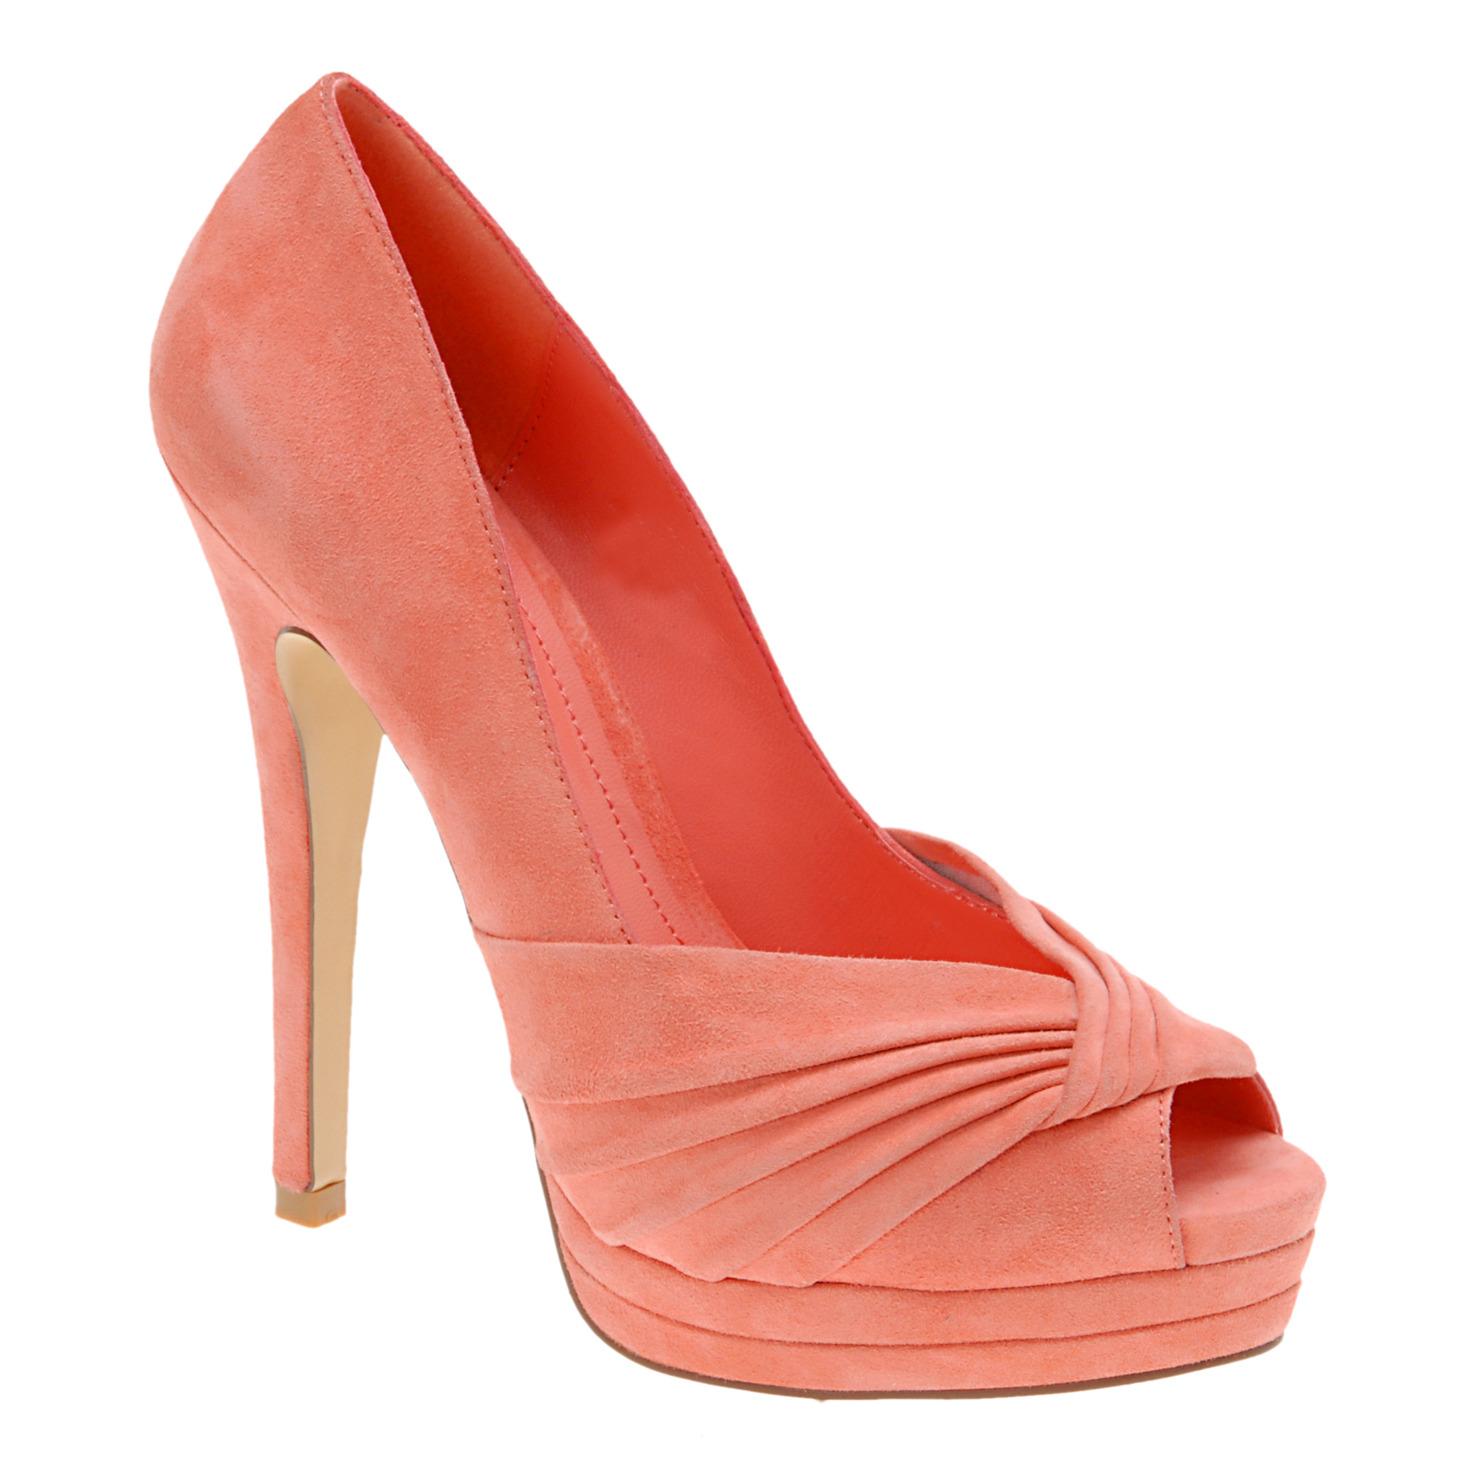 http://1.bp.blogspot.com/_7UZIREVjKto/THQU7v2sVcI/AAAAAAAAAI4/IvLPzKr47_Q/s1600/+aldo+shoes+orpin.jpg